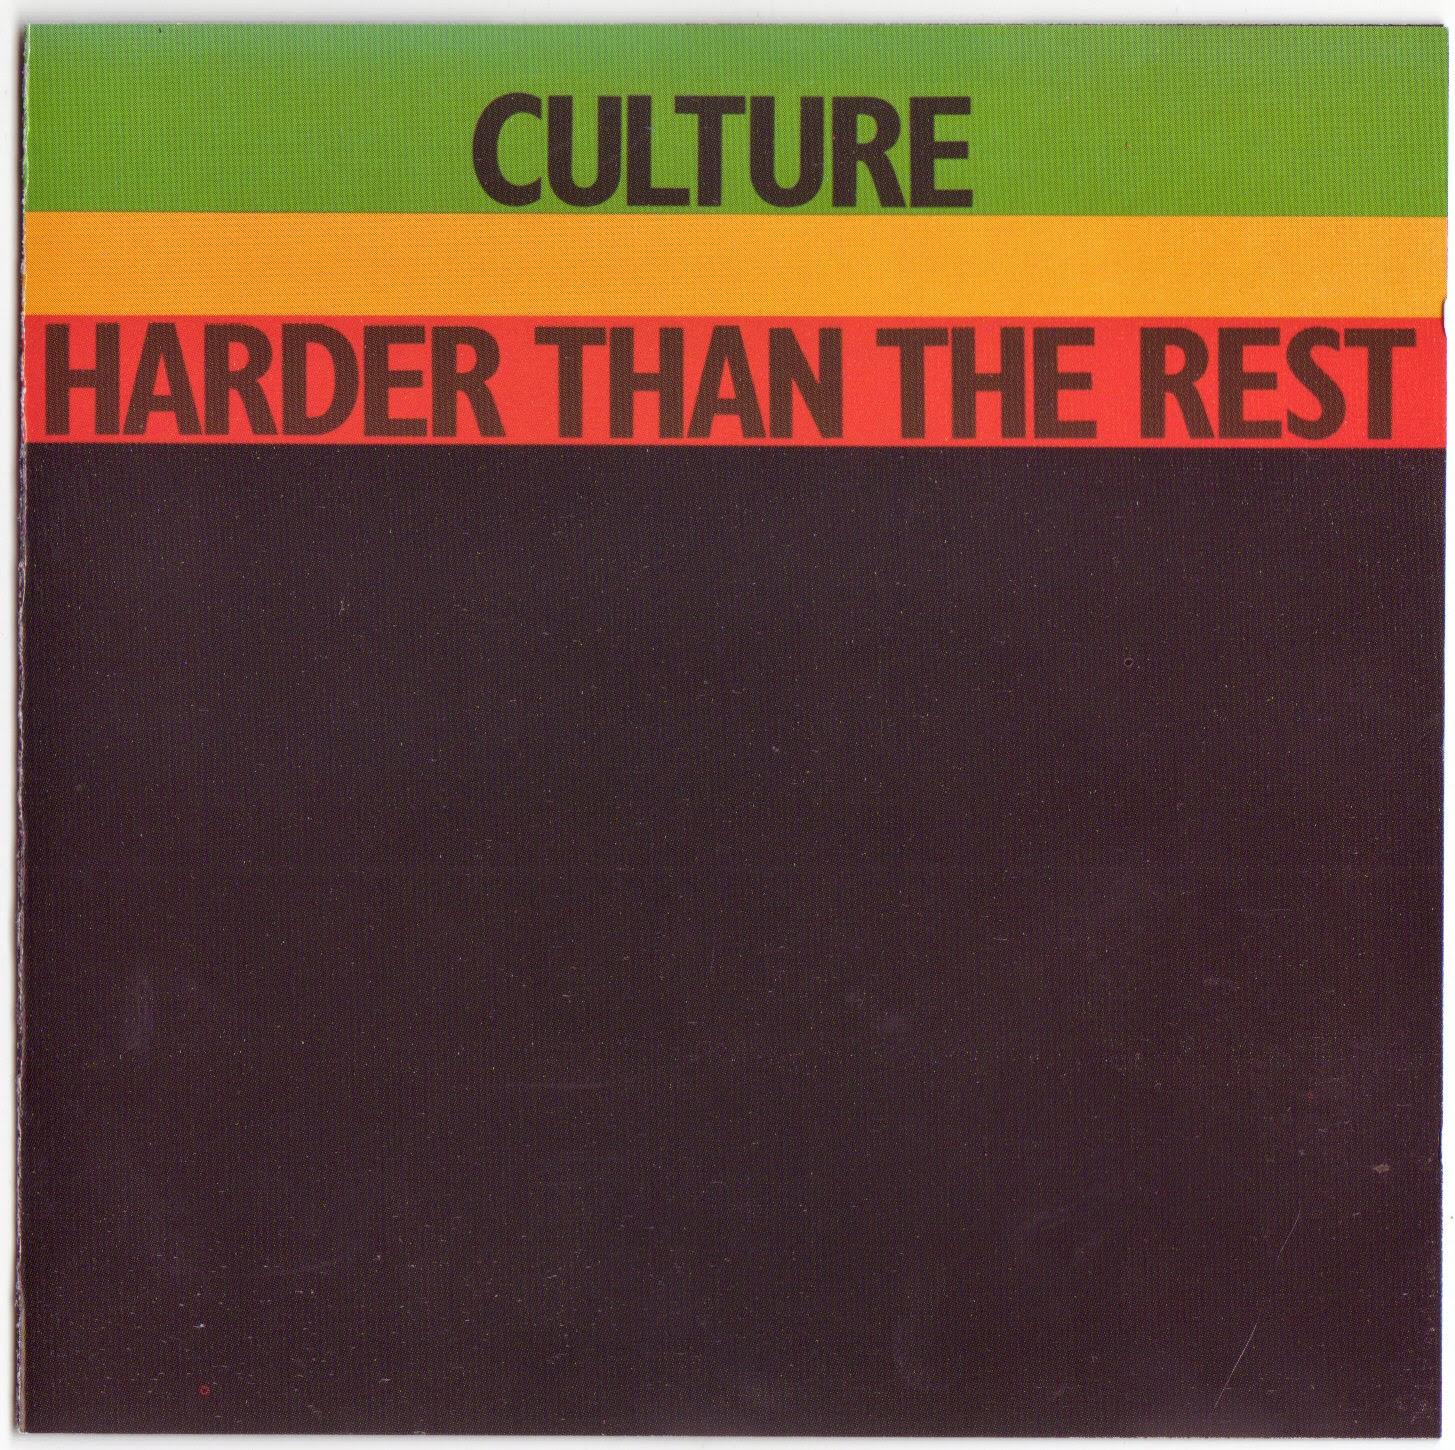 ROOTSBLOGSPOT COM: Culture - Harder Than The Rest [1978]